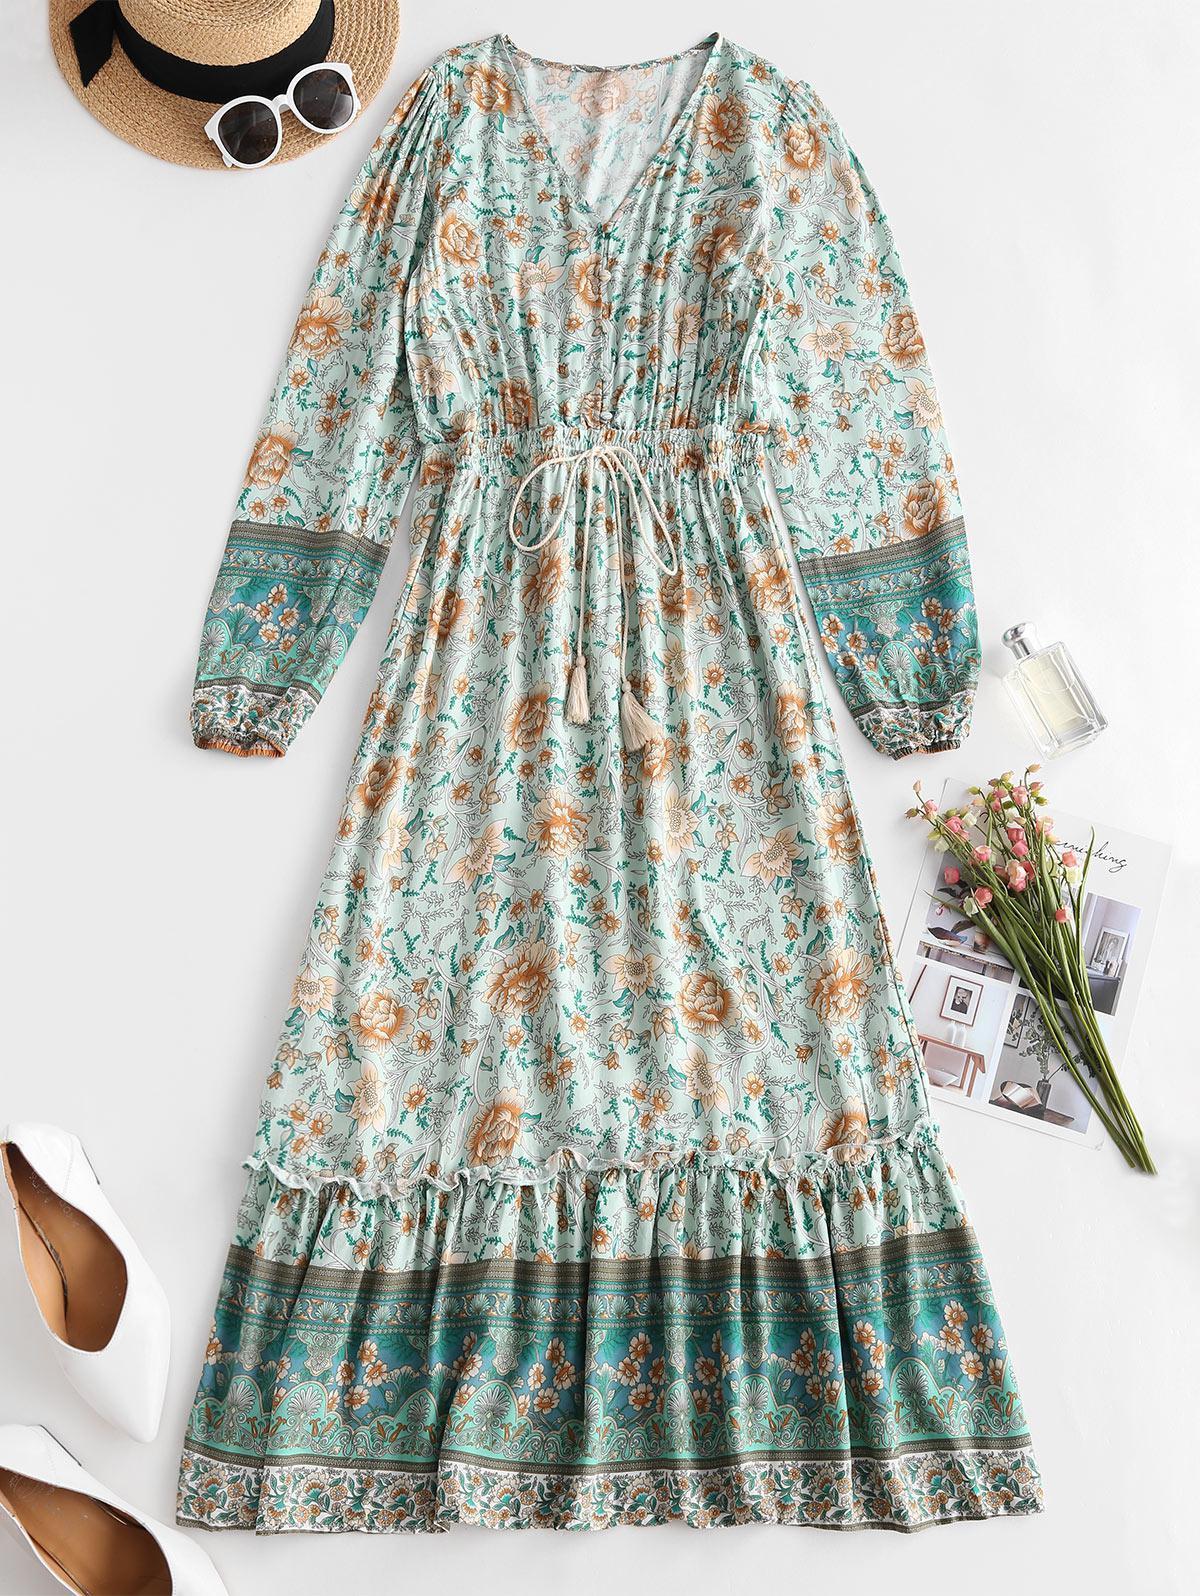 Floral Button Loop Tassels Bohemian Dress